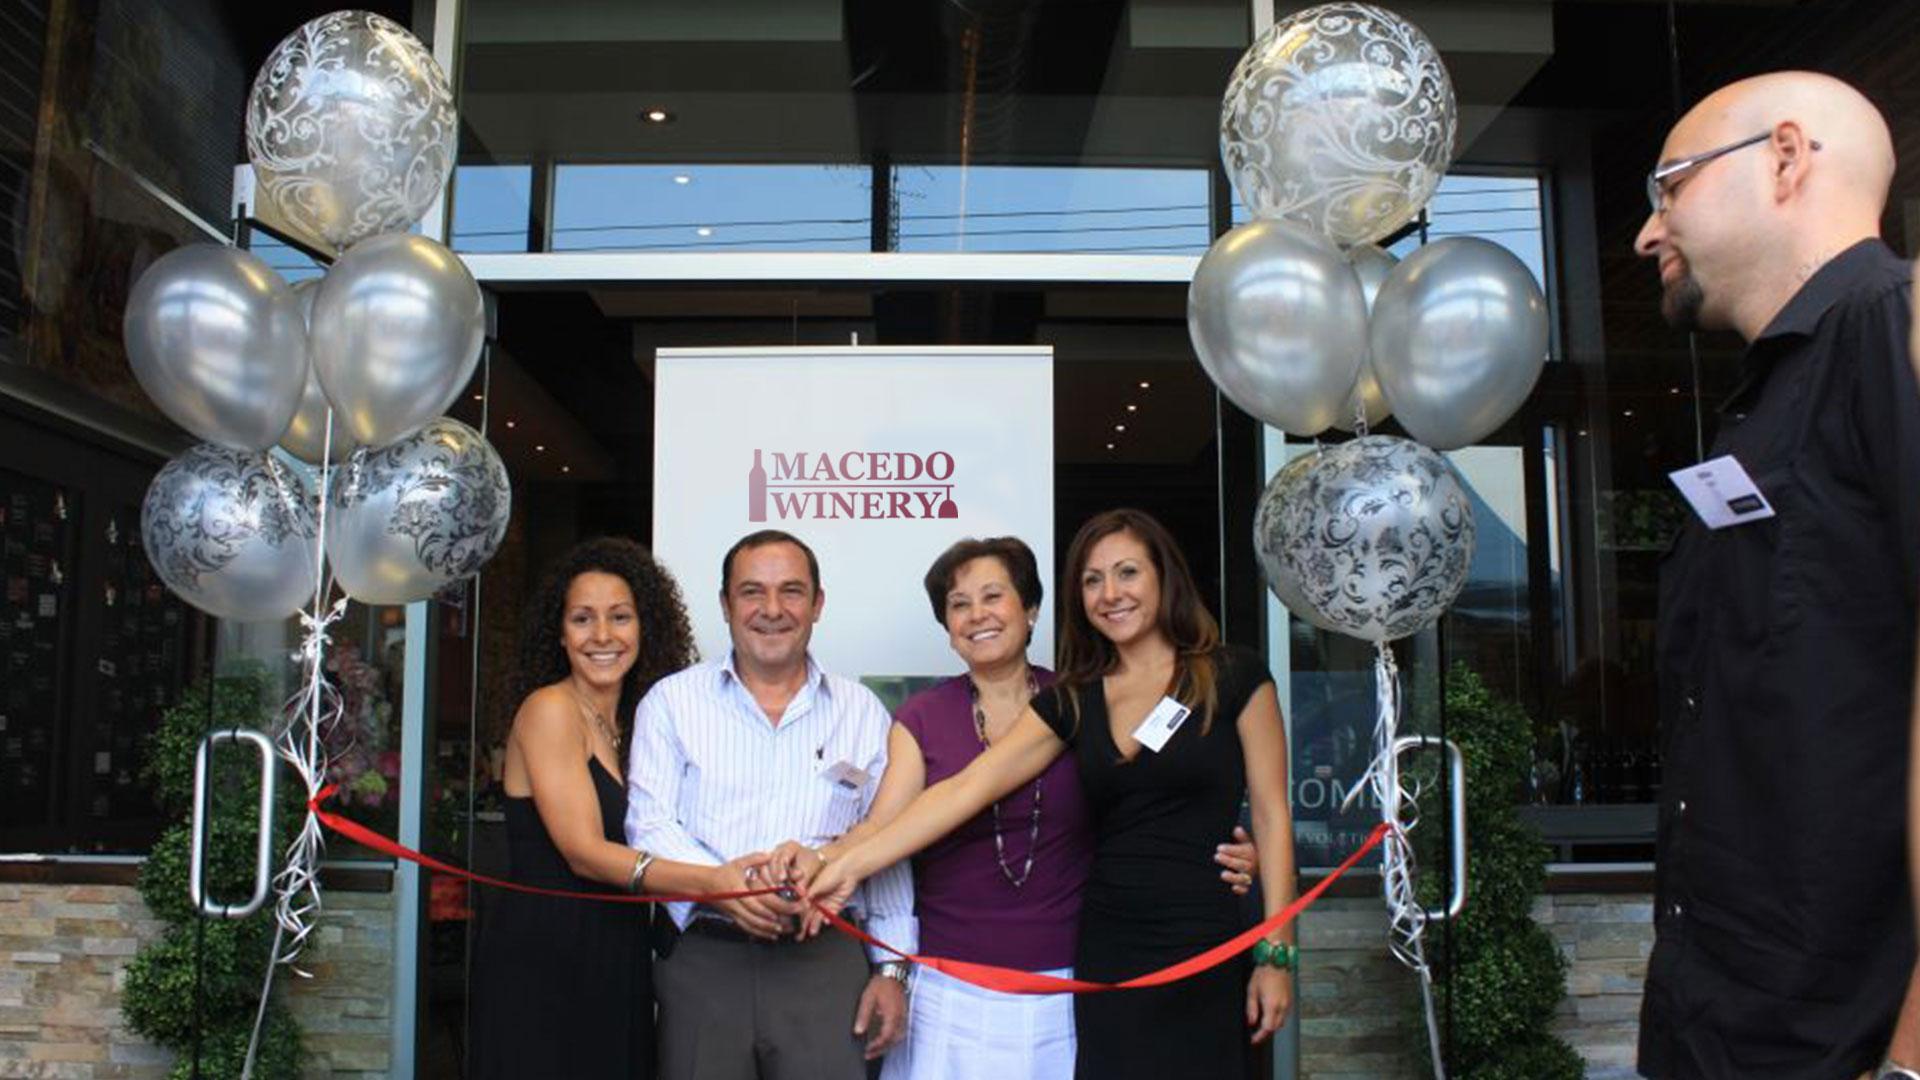 macedo-winery-gallery-large03.jpg